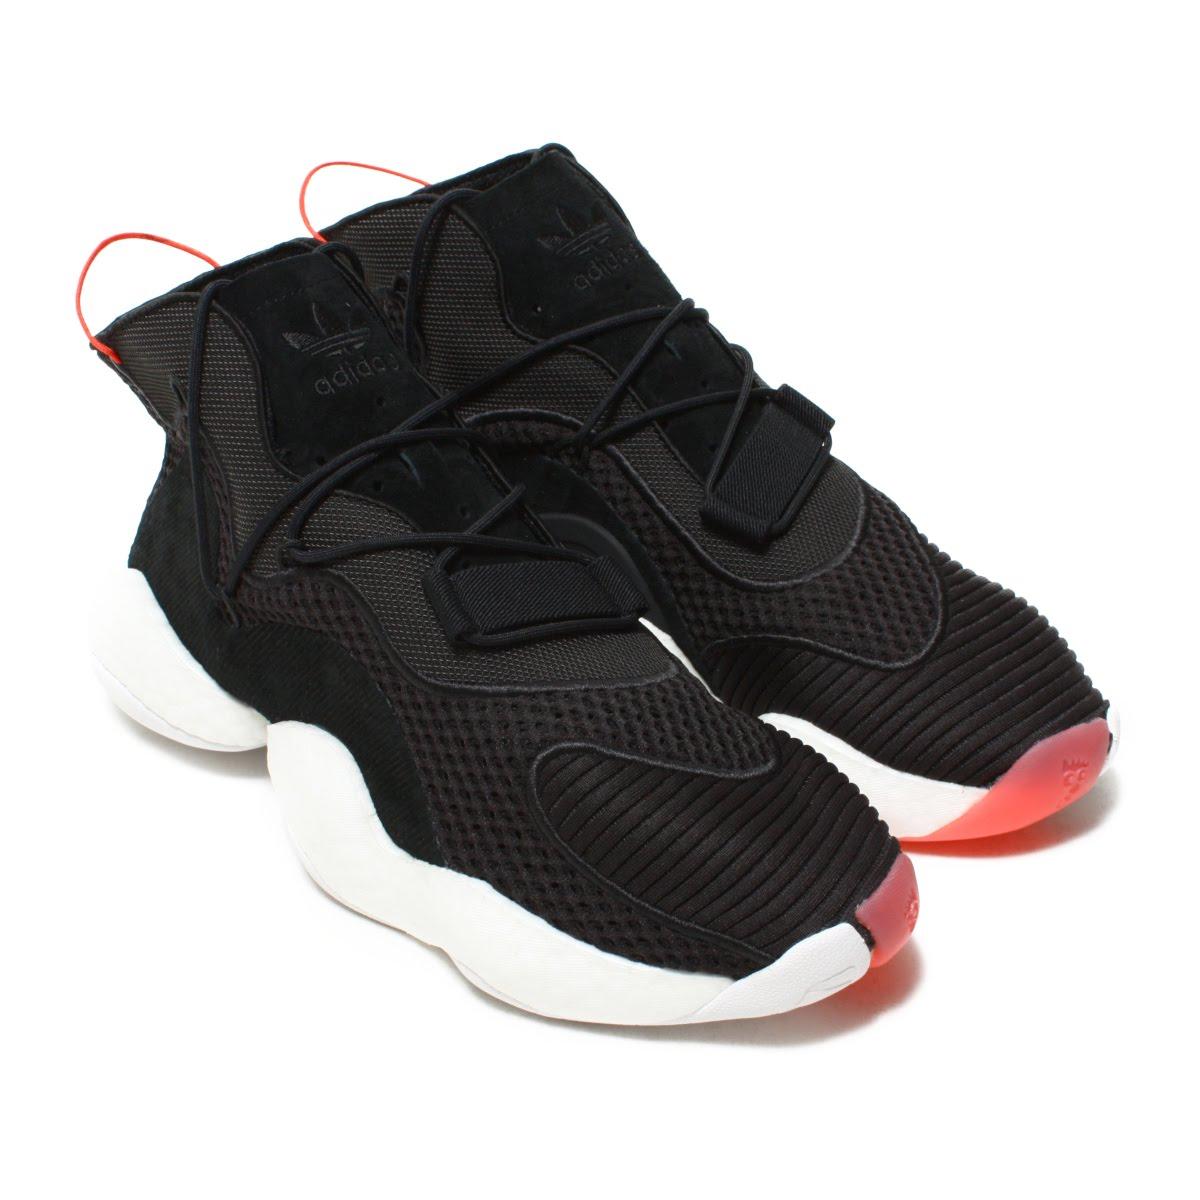 best service eda3f 1304c adidas Originals CRAZY BYW LVL I (Adidas crazy BYW LVL1) Core Black.Running  WhiteBright Red 18FW-I